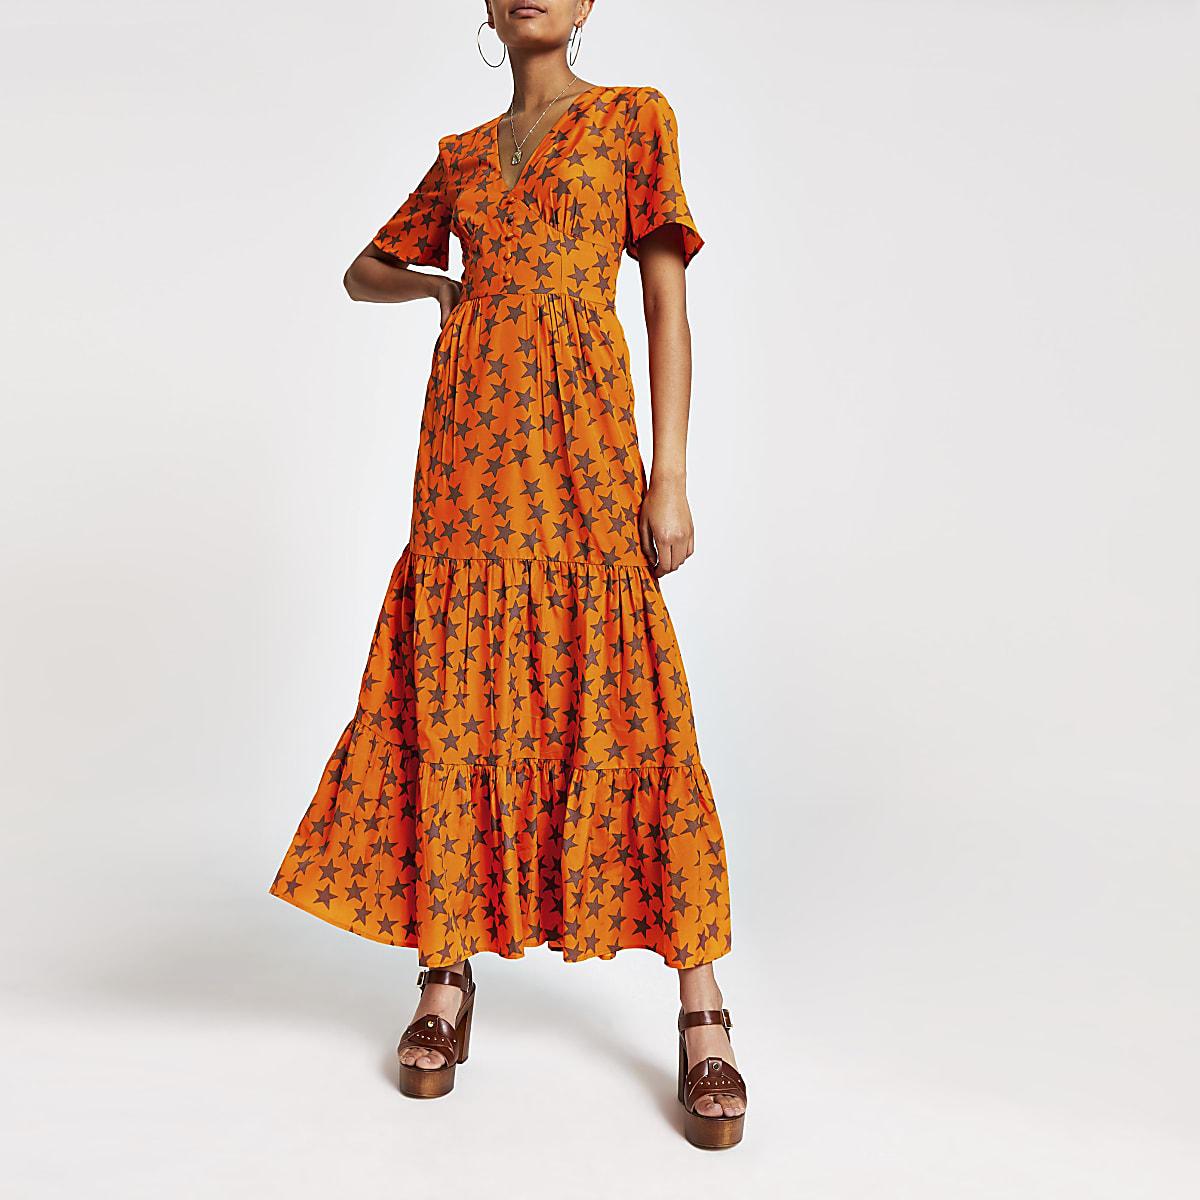 Oranje maxi-jurk met sterrenprint en knoopsluiting voor